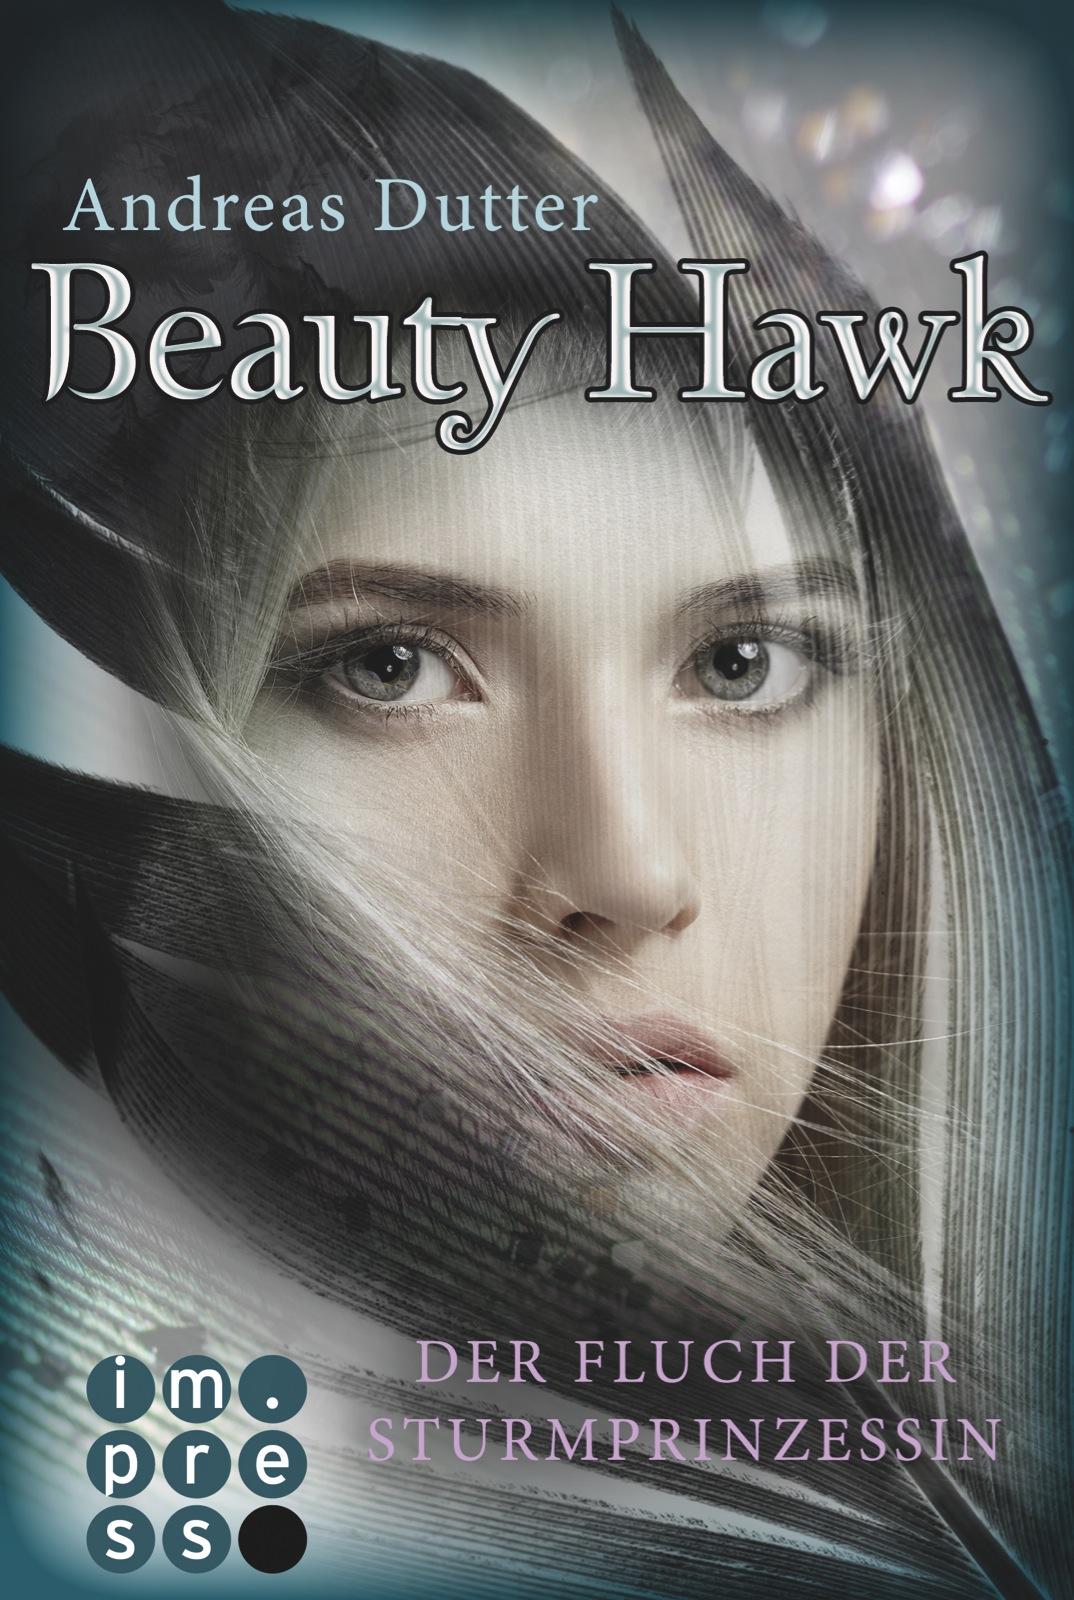 beauty-hawk-der-fluch-der-sturmprinzessin